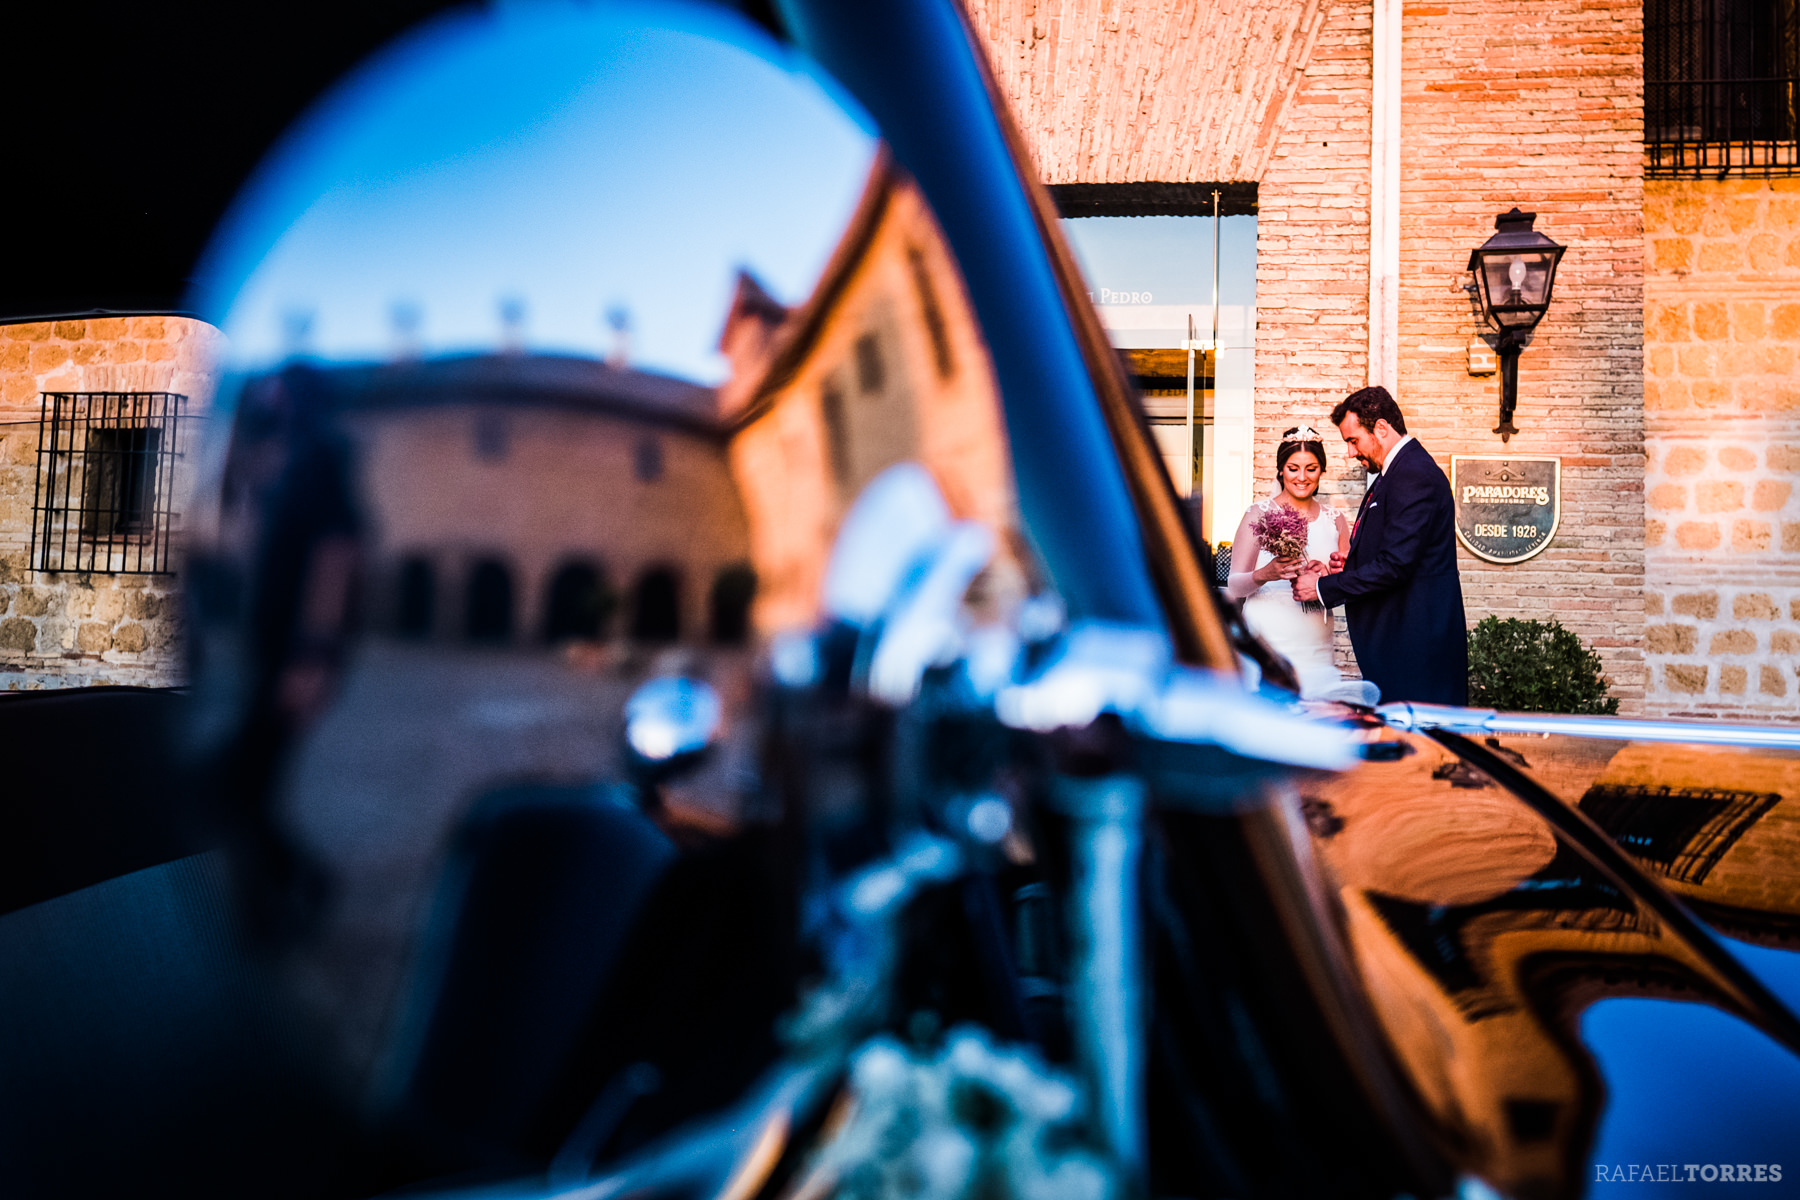 bea-juan-carmona-fotografo-boda-en-sevilla-rafael-torres-photo-42.jpg